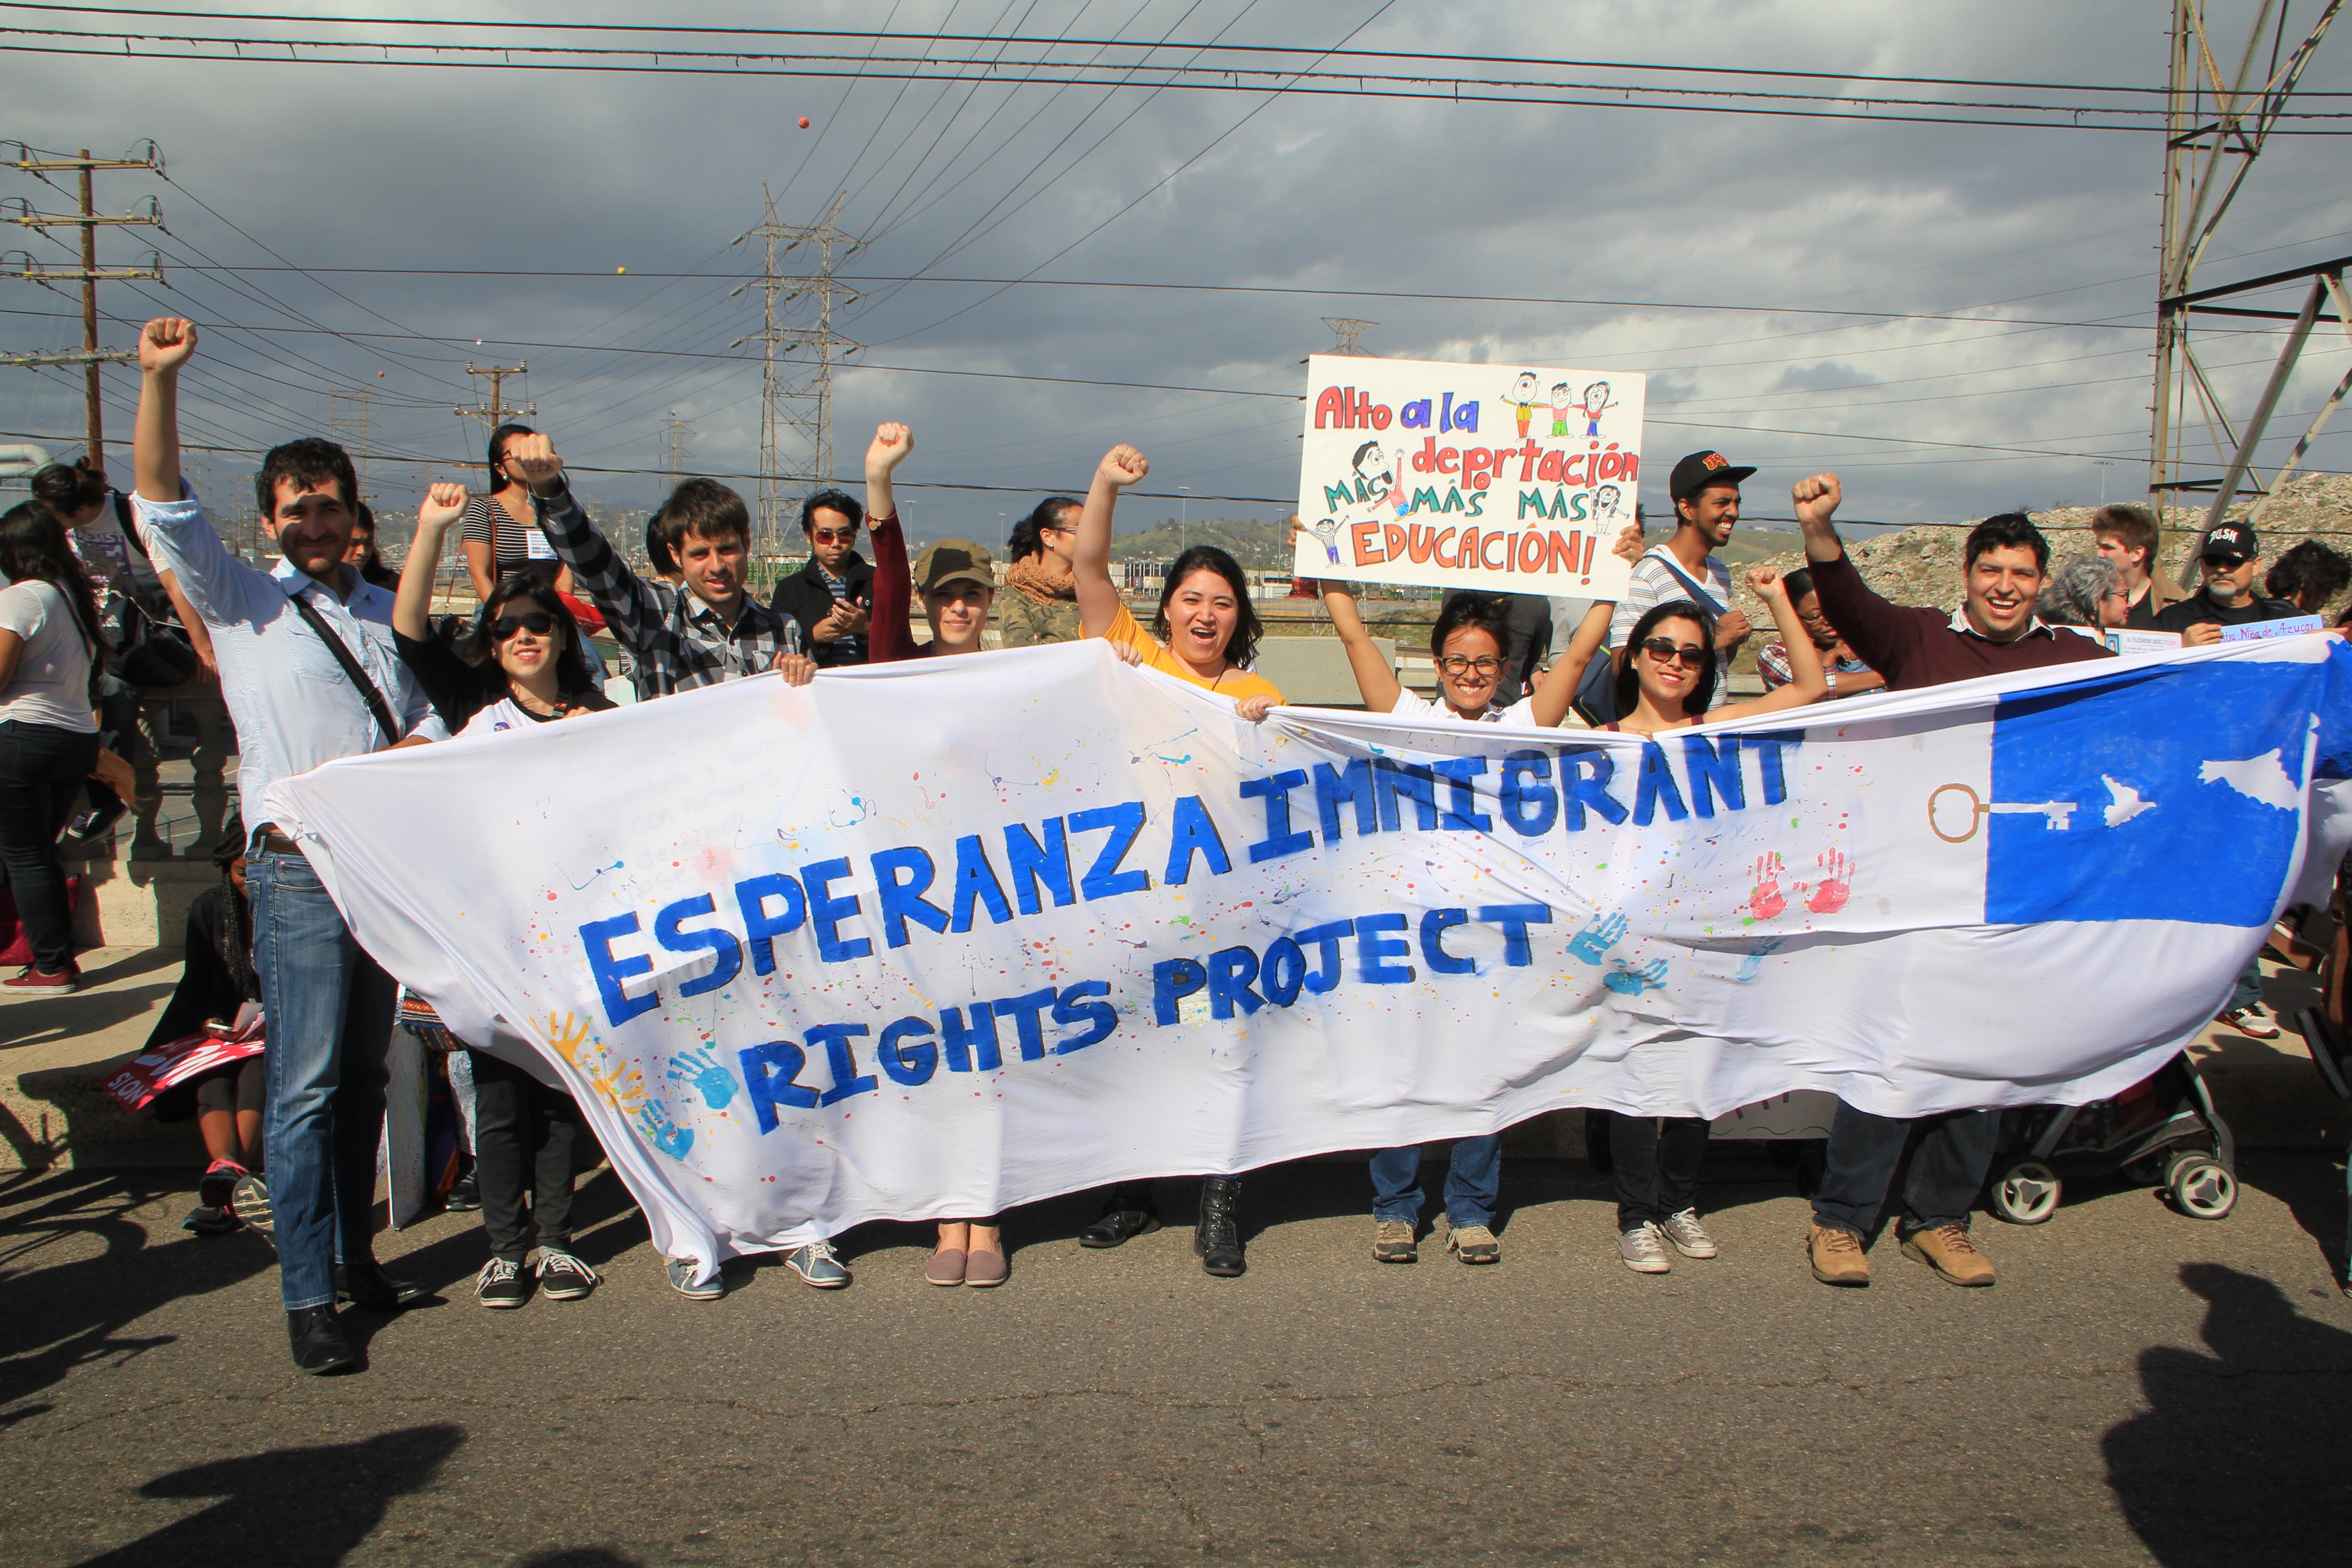 Esperanza Immigrant Rights Project Los Angeles